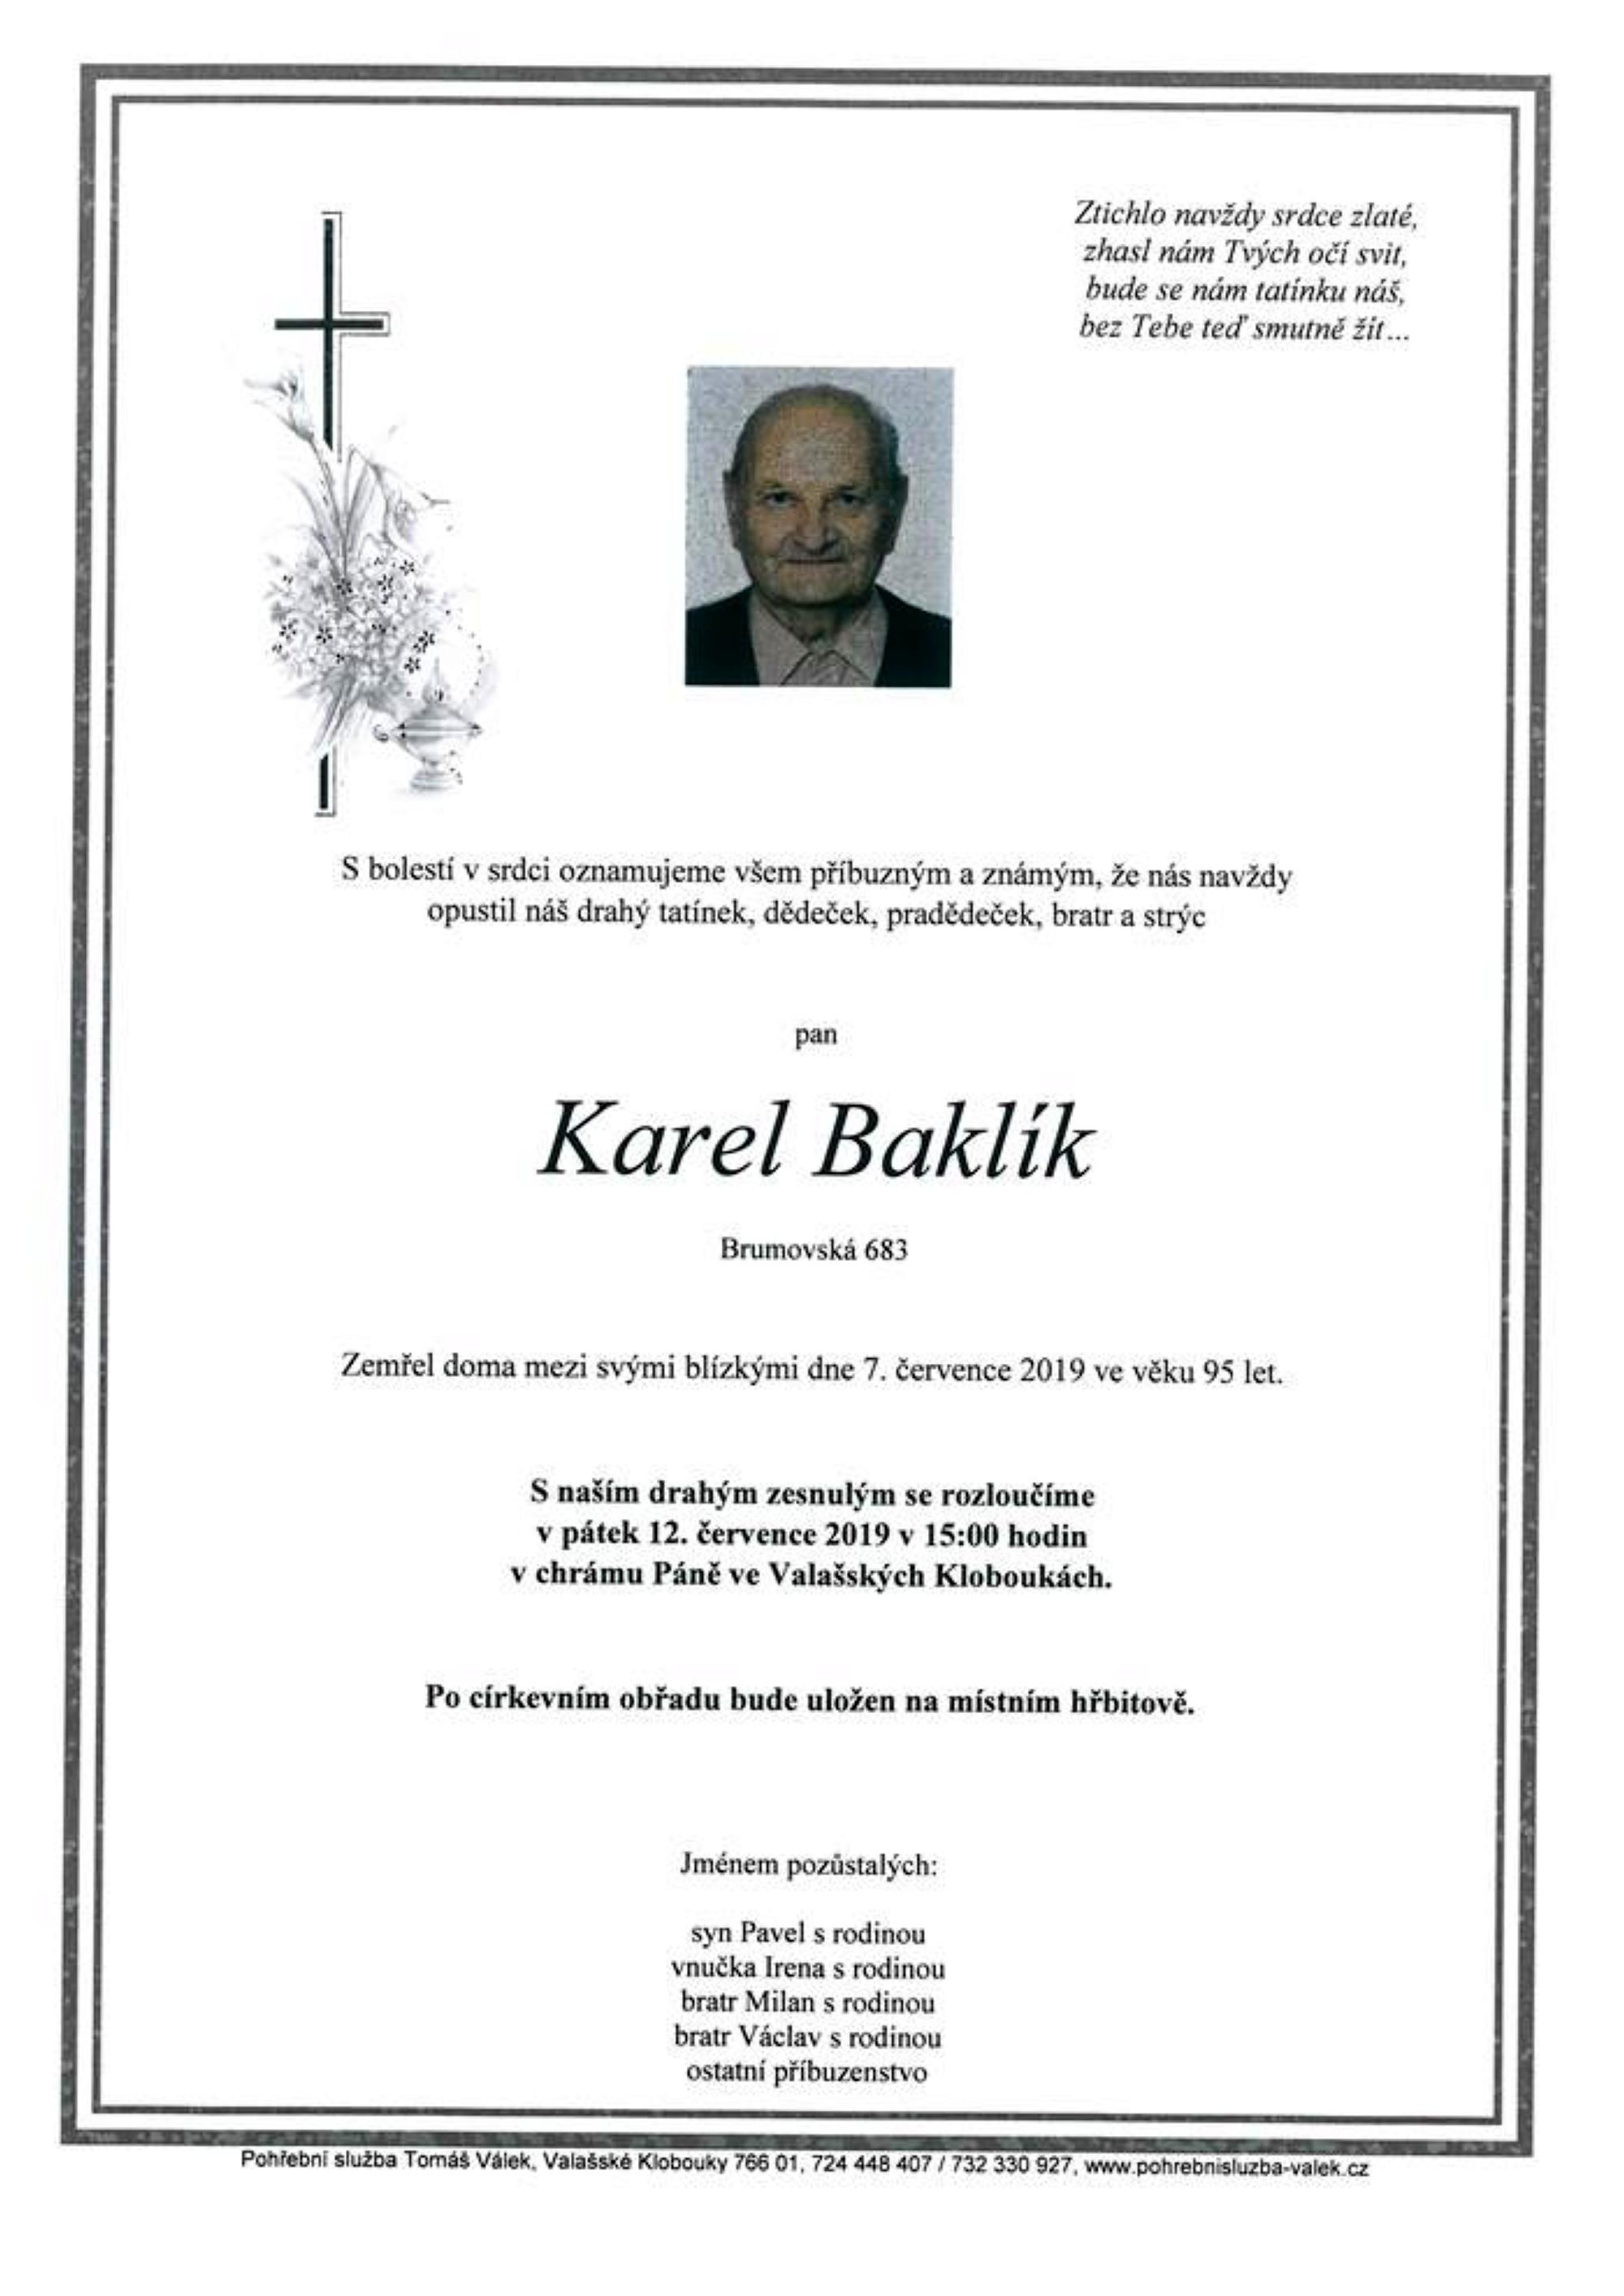 Karel Baklík